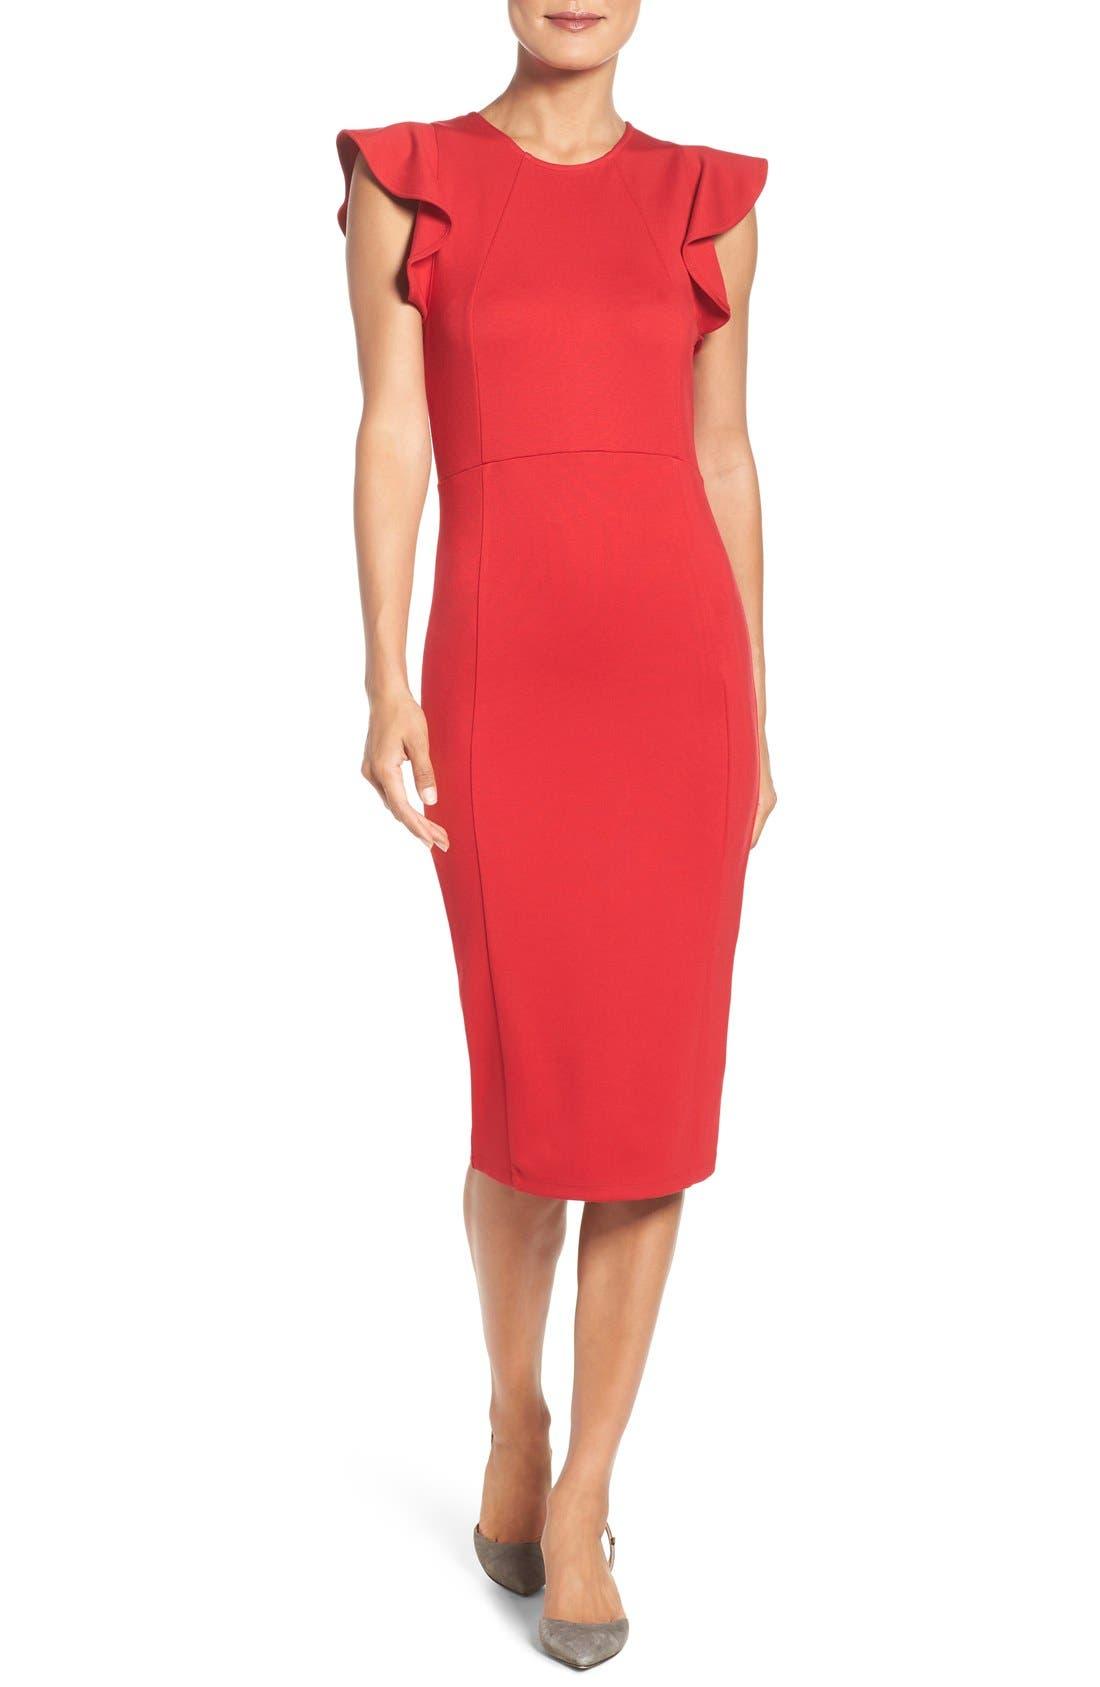 Felicity & Coco Ruffle Sheath Dress (Regular & Petite) (Nordstrom Exclusive)